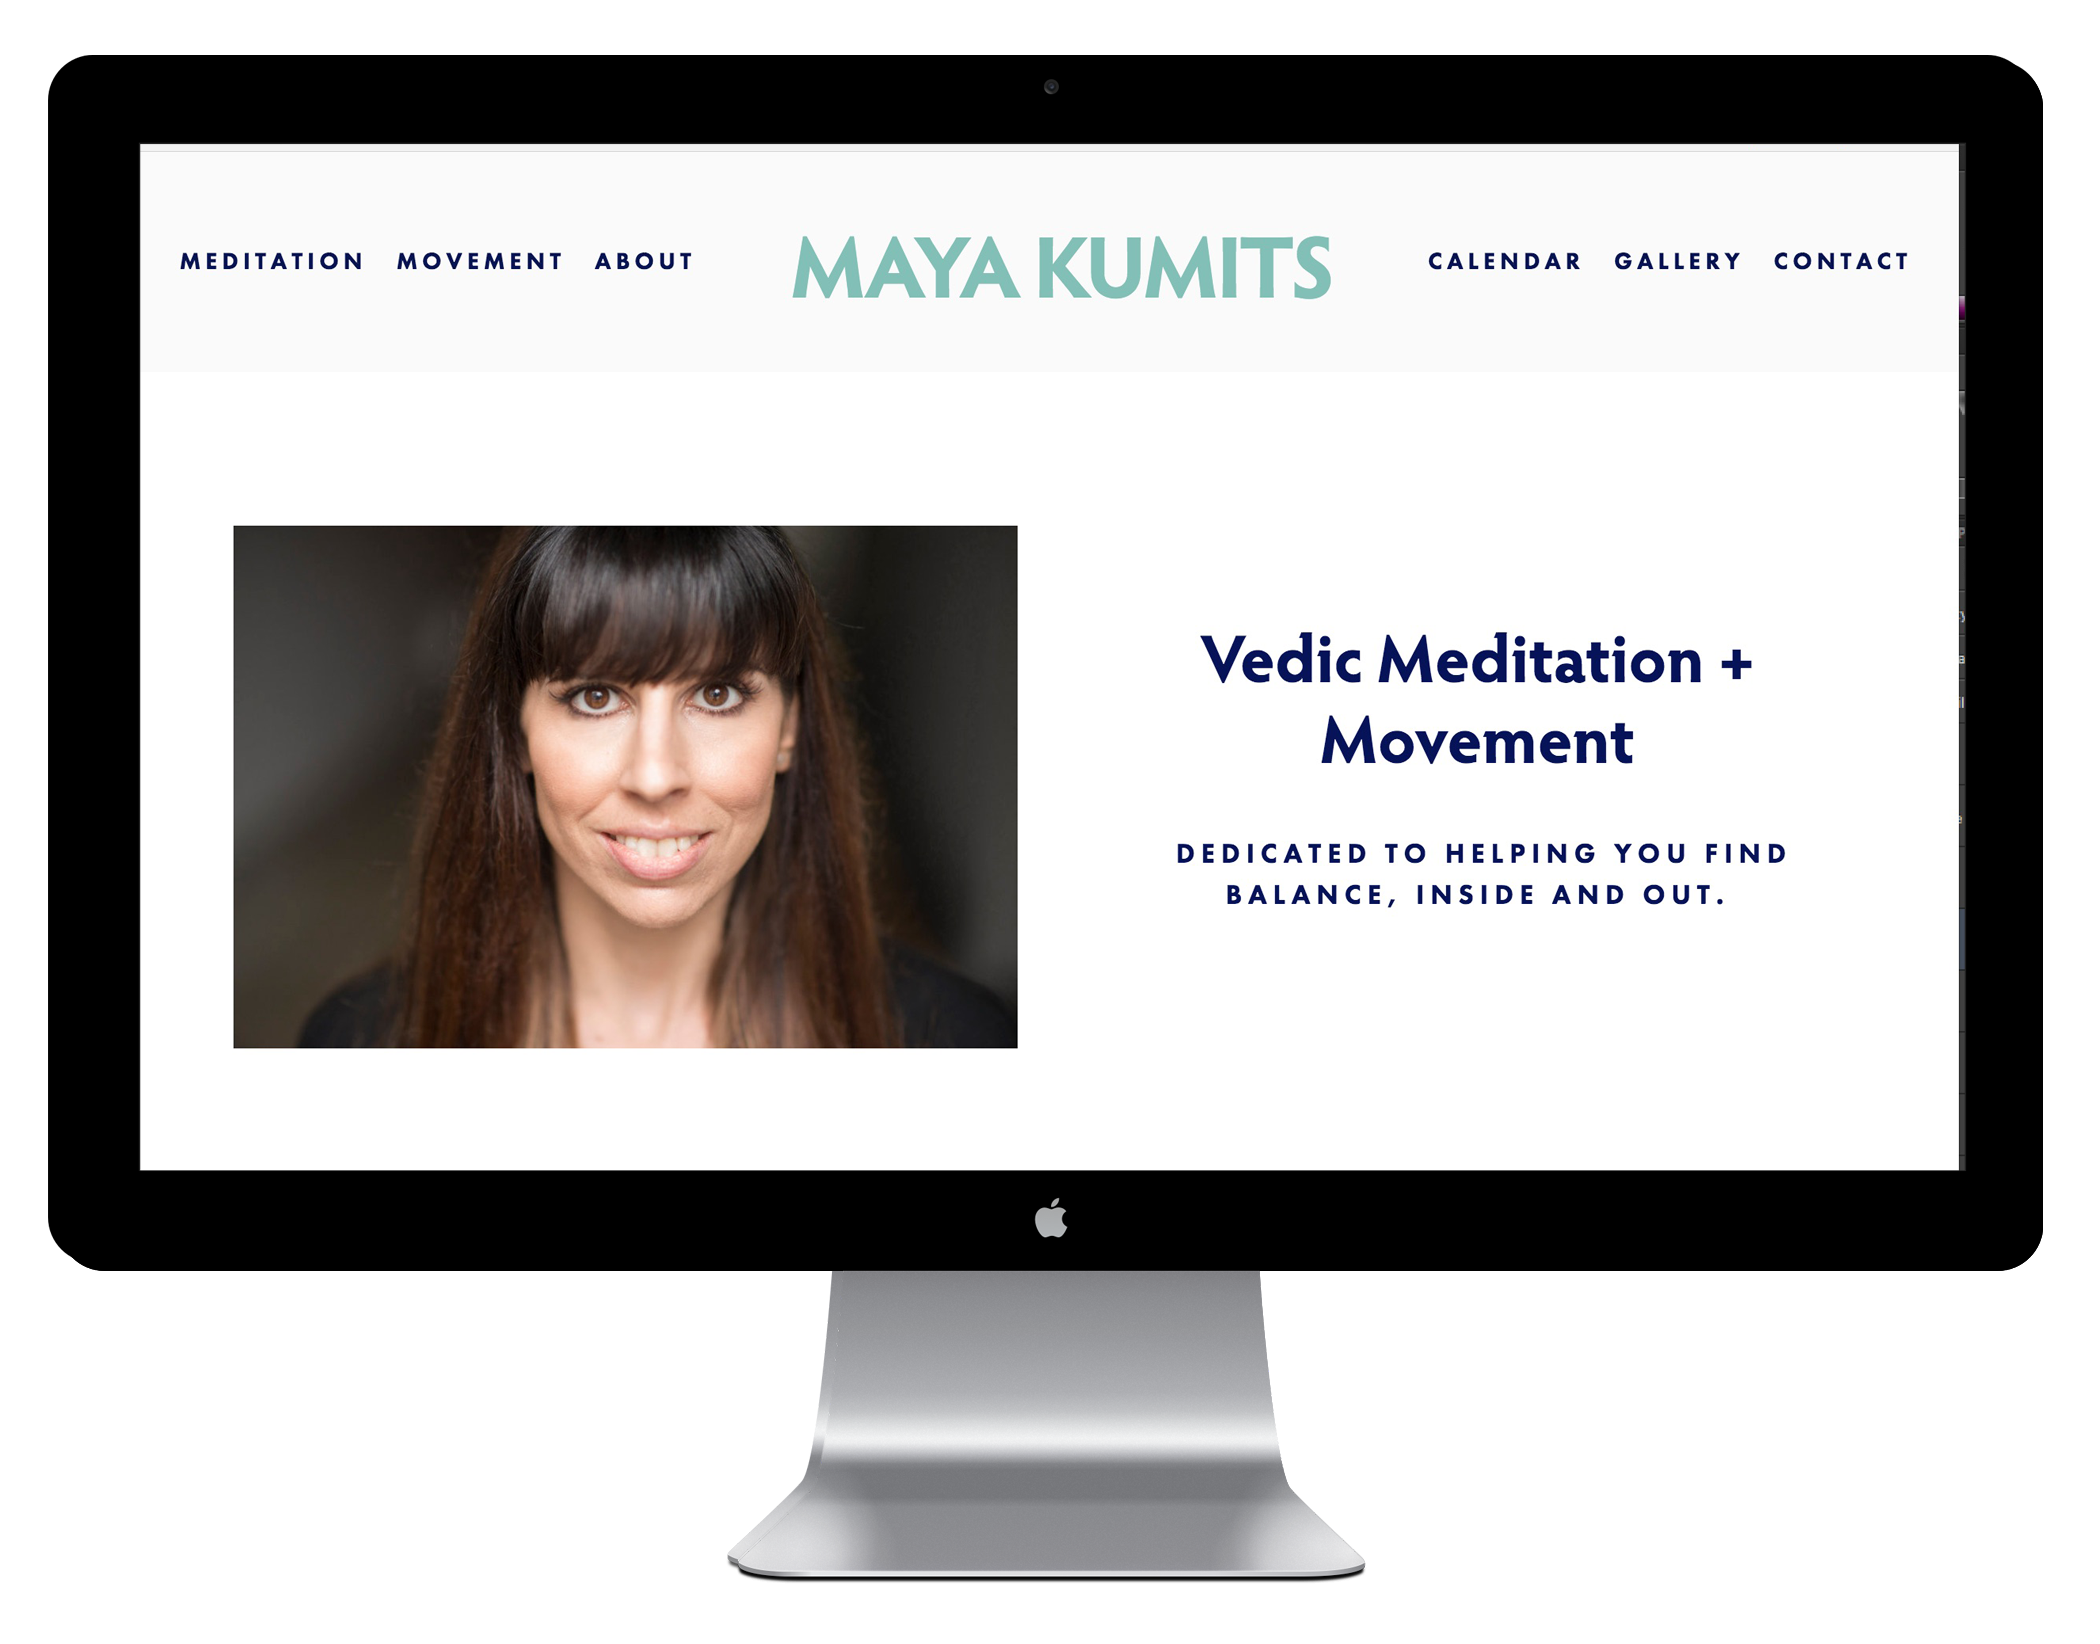 devaworks-website-design-maya-kumits-meditation-movement.png